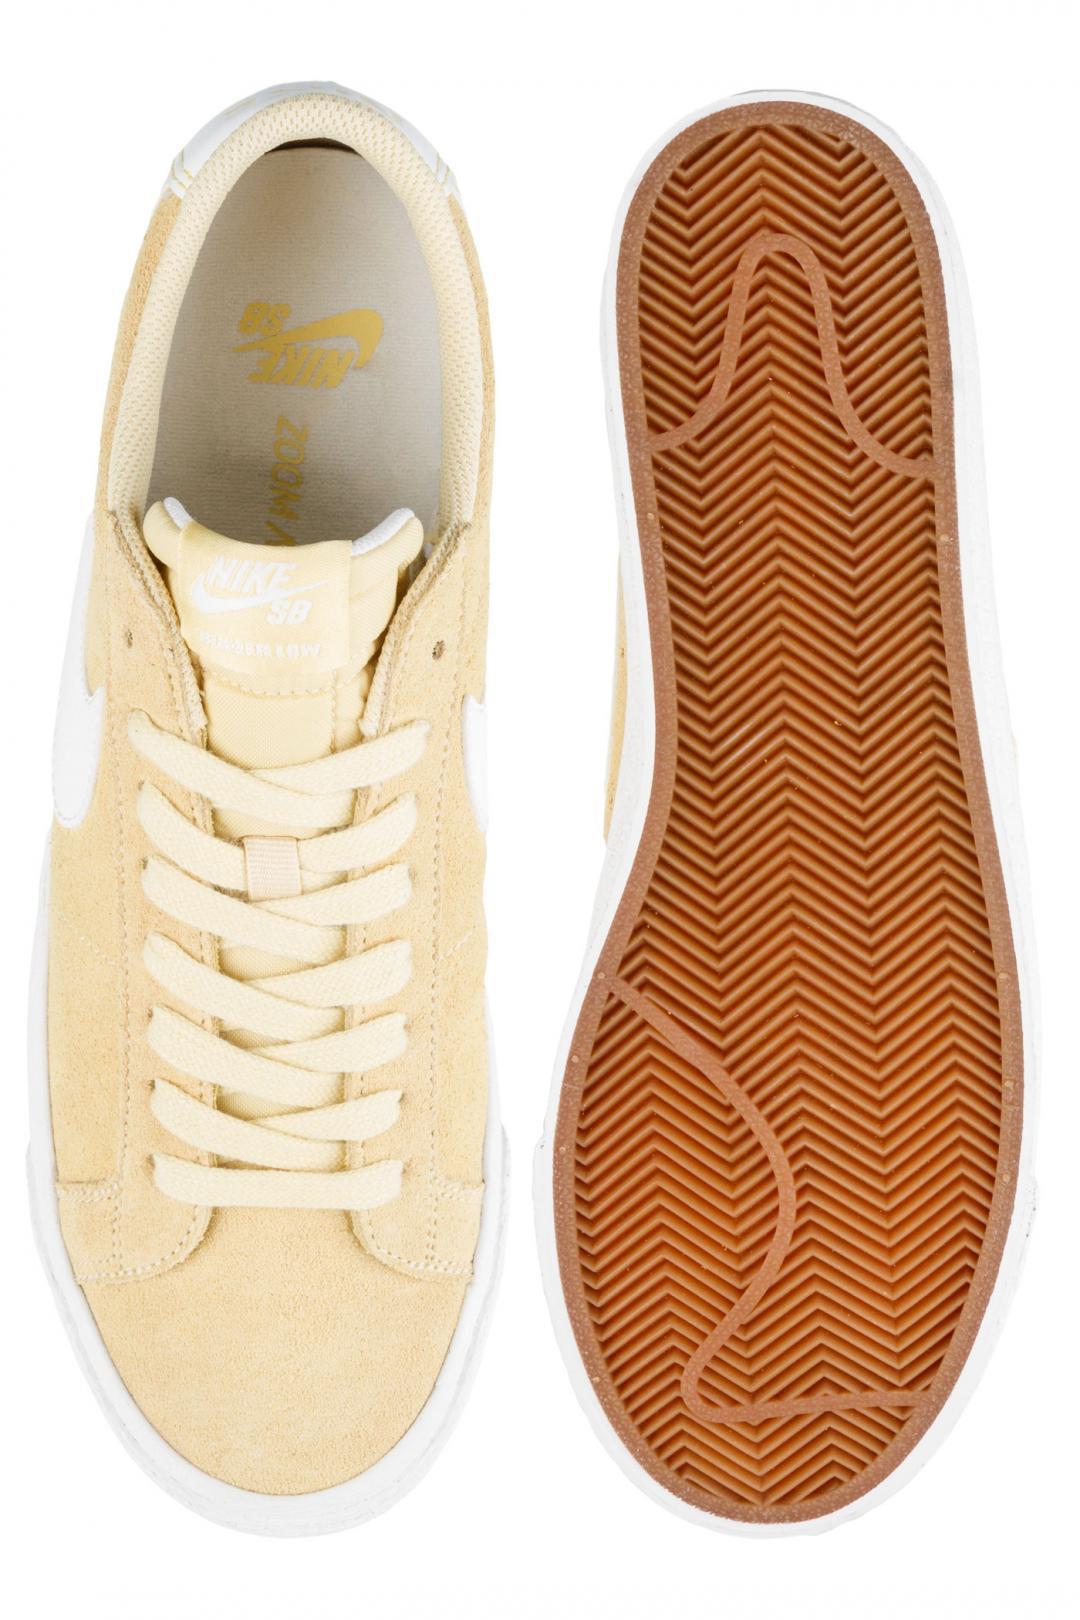 Uomo Nike SB Zoom Blazer Low lemon wash summit white   Scarpe da skate